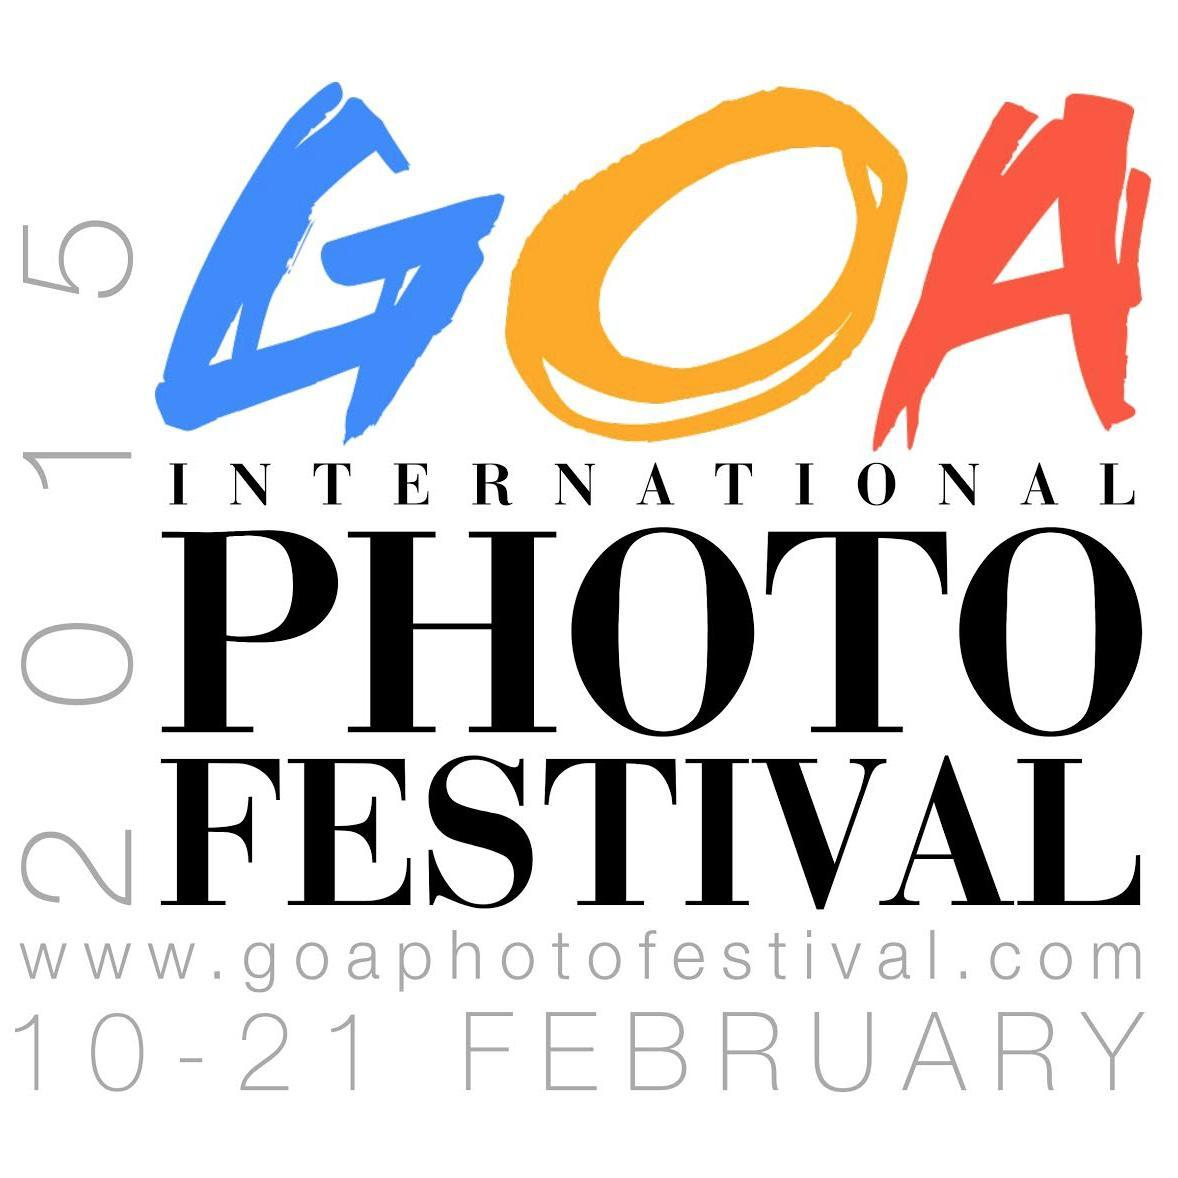 Goa Int Photo Fest (@Goaphotofest) : Twitter